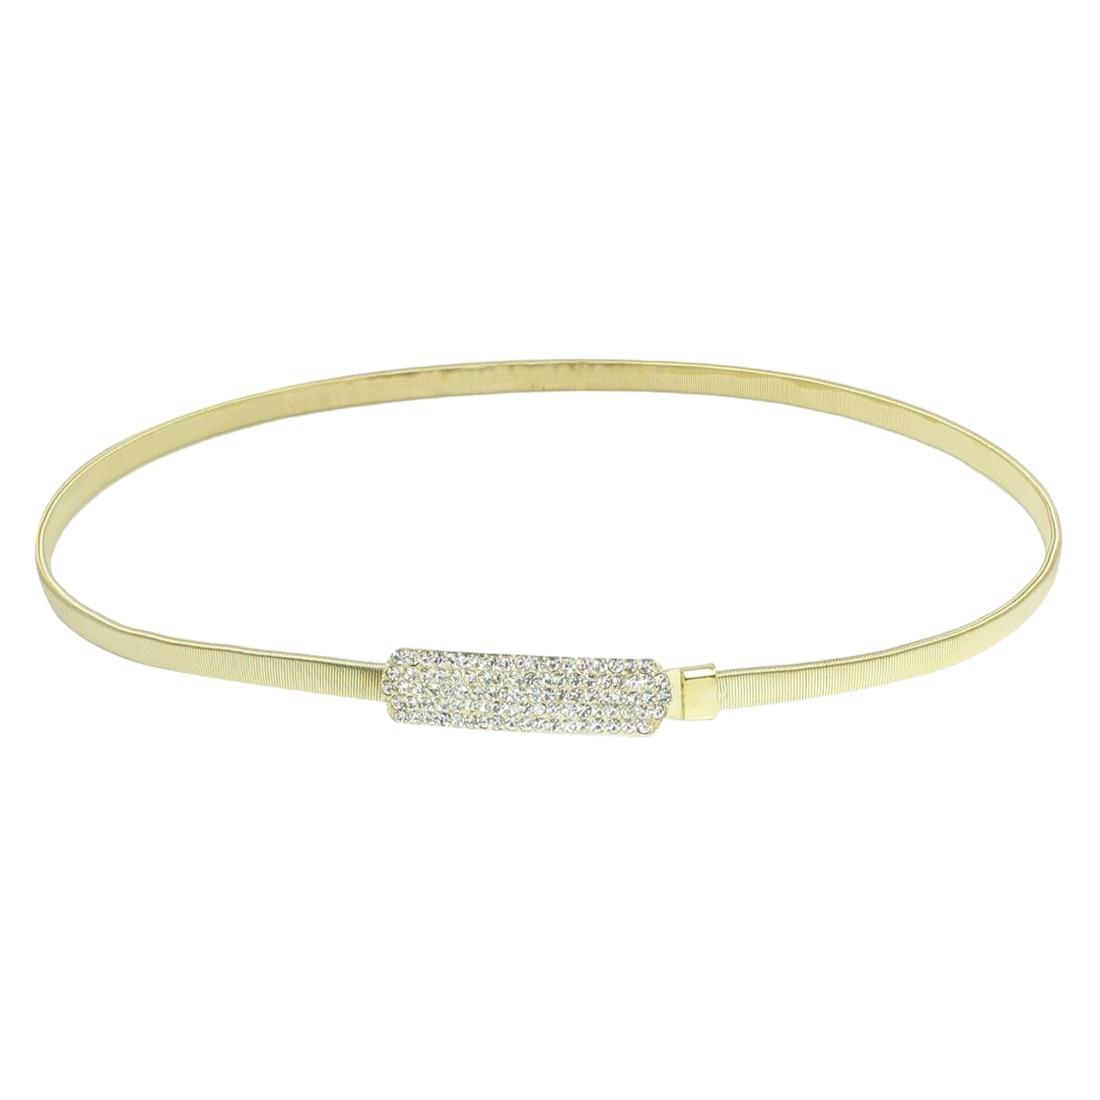 Metal Rectangle Interlocking Buckle Elastic Waist Chain for Lady